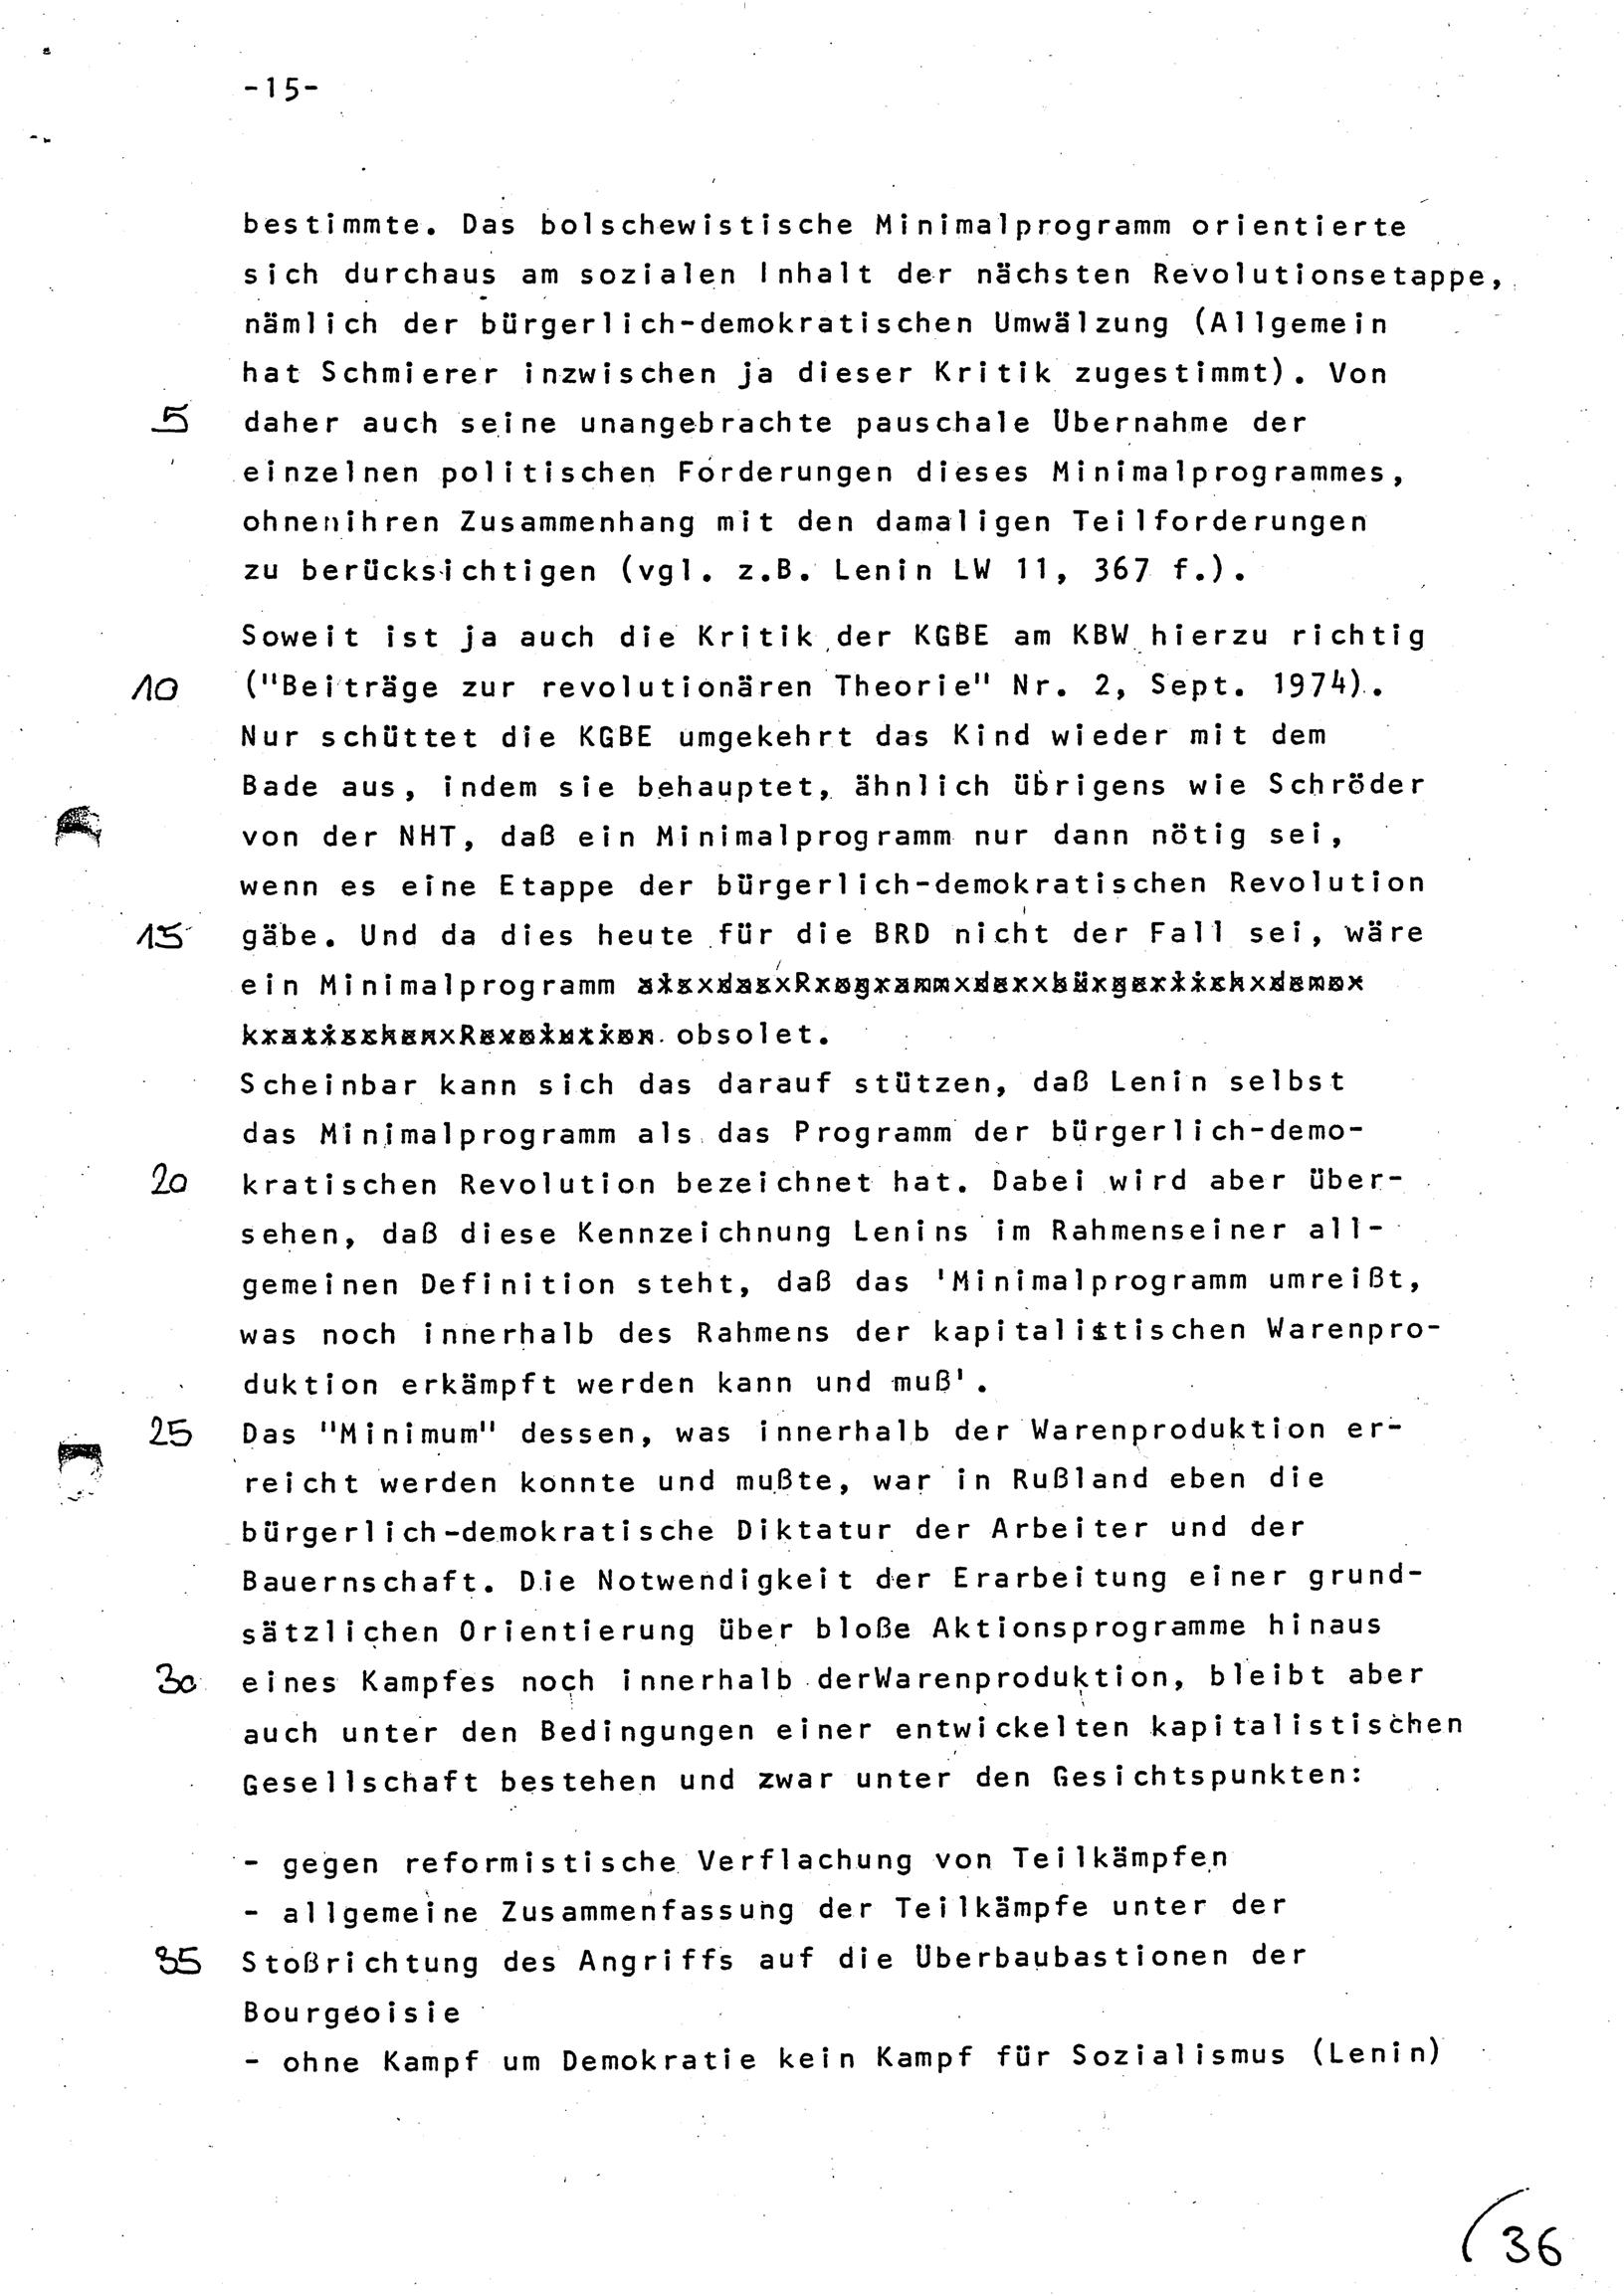 Ulm_KGU_Arbeitsheft_19830425_015_039